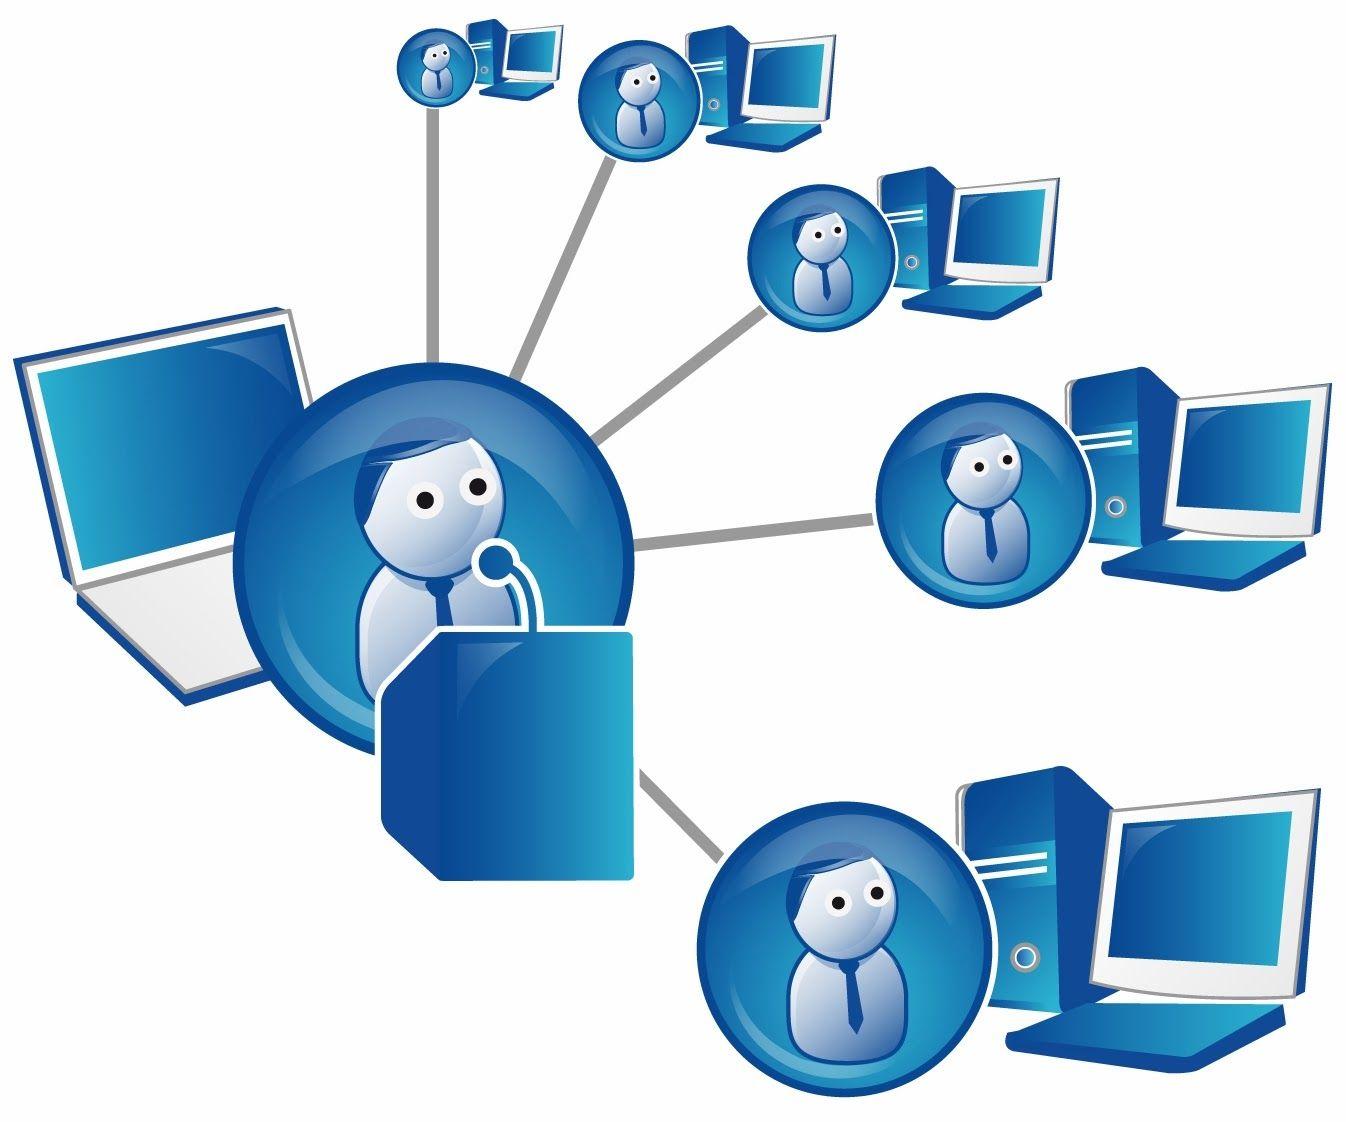 Структура проведения вебинара